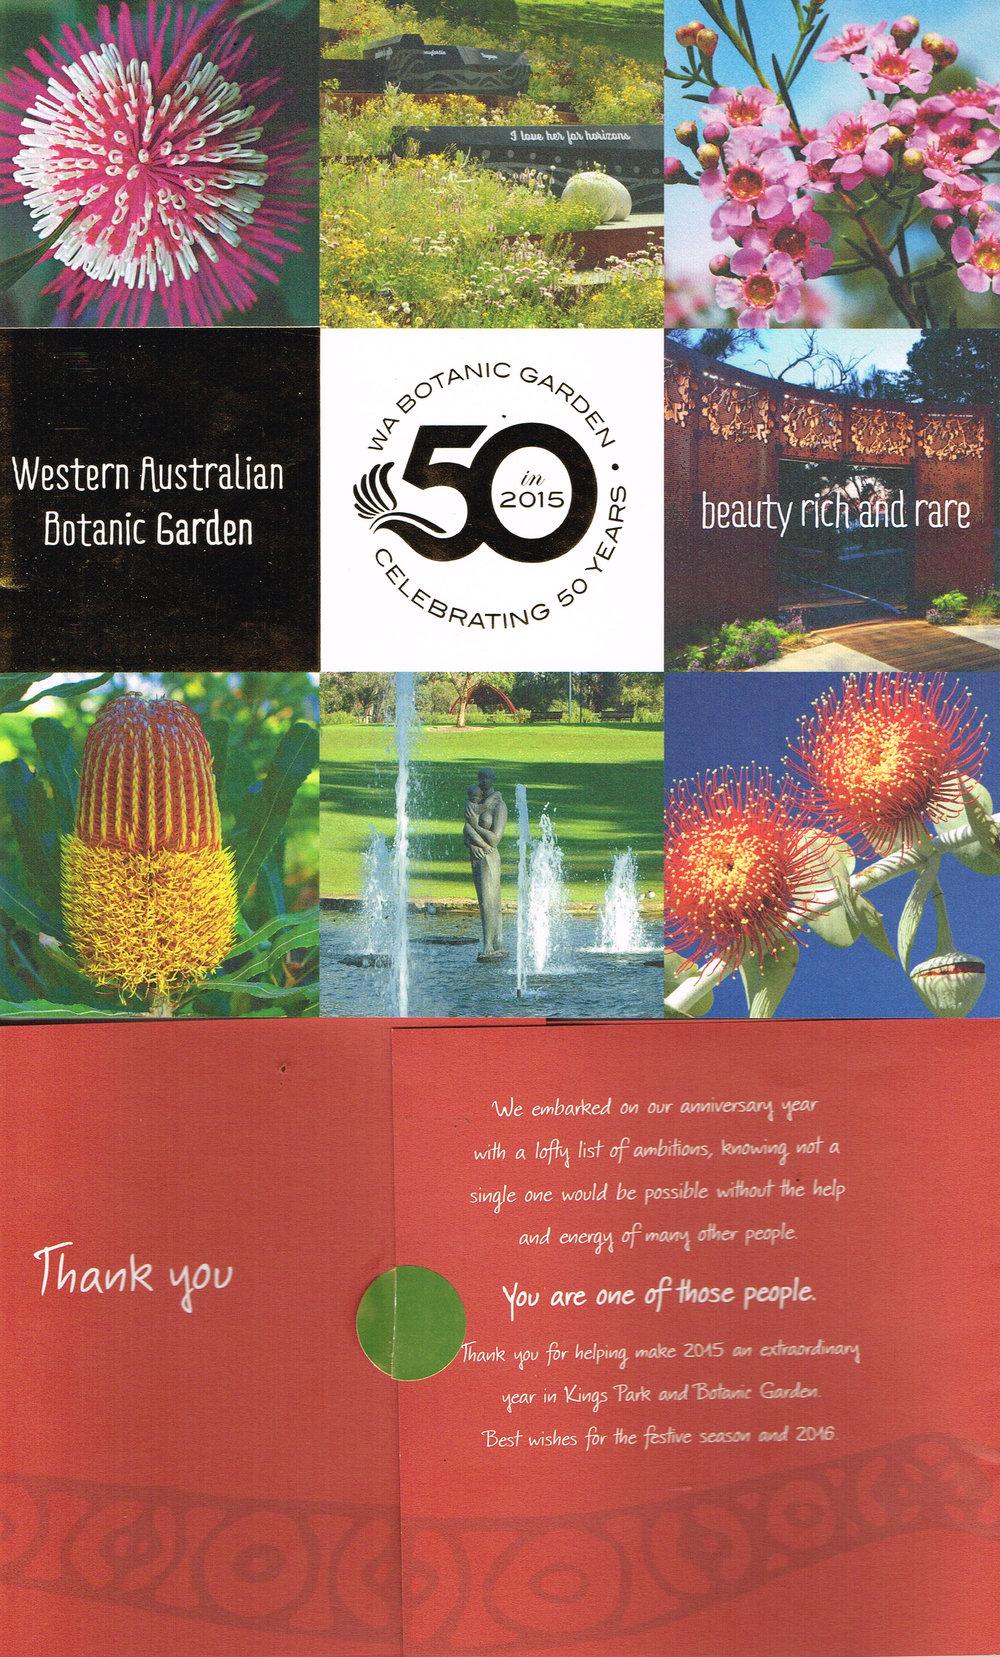 Western Australian Botanic Garden : WA Botanic Garden Celebrating 50 Years   Government of Western Australia and Kings Park & Botanic Garden, Botanic Gardens & Parks Authority